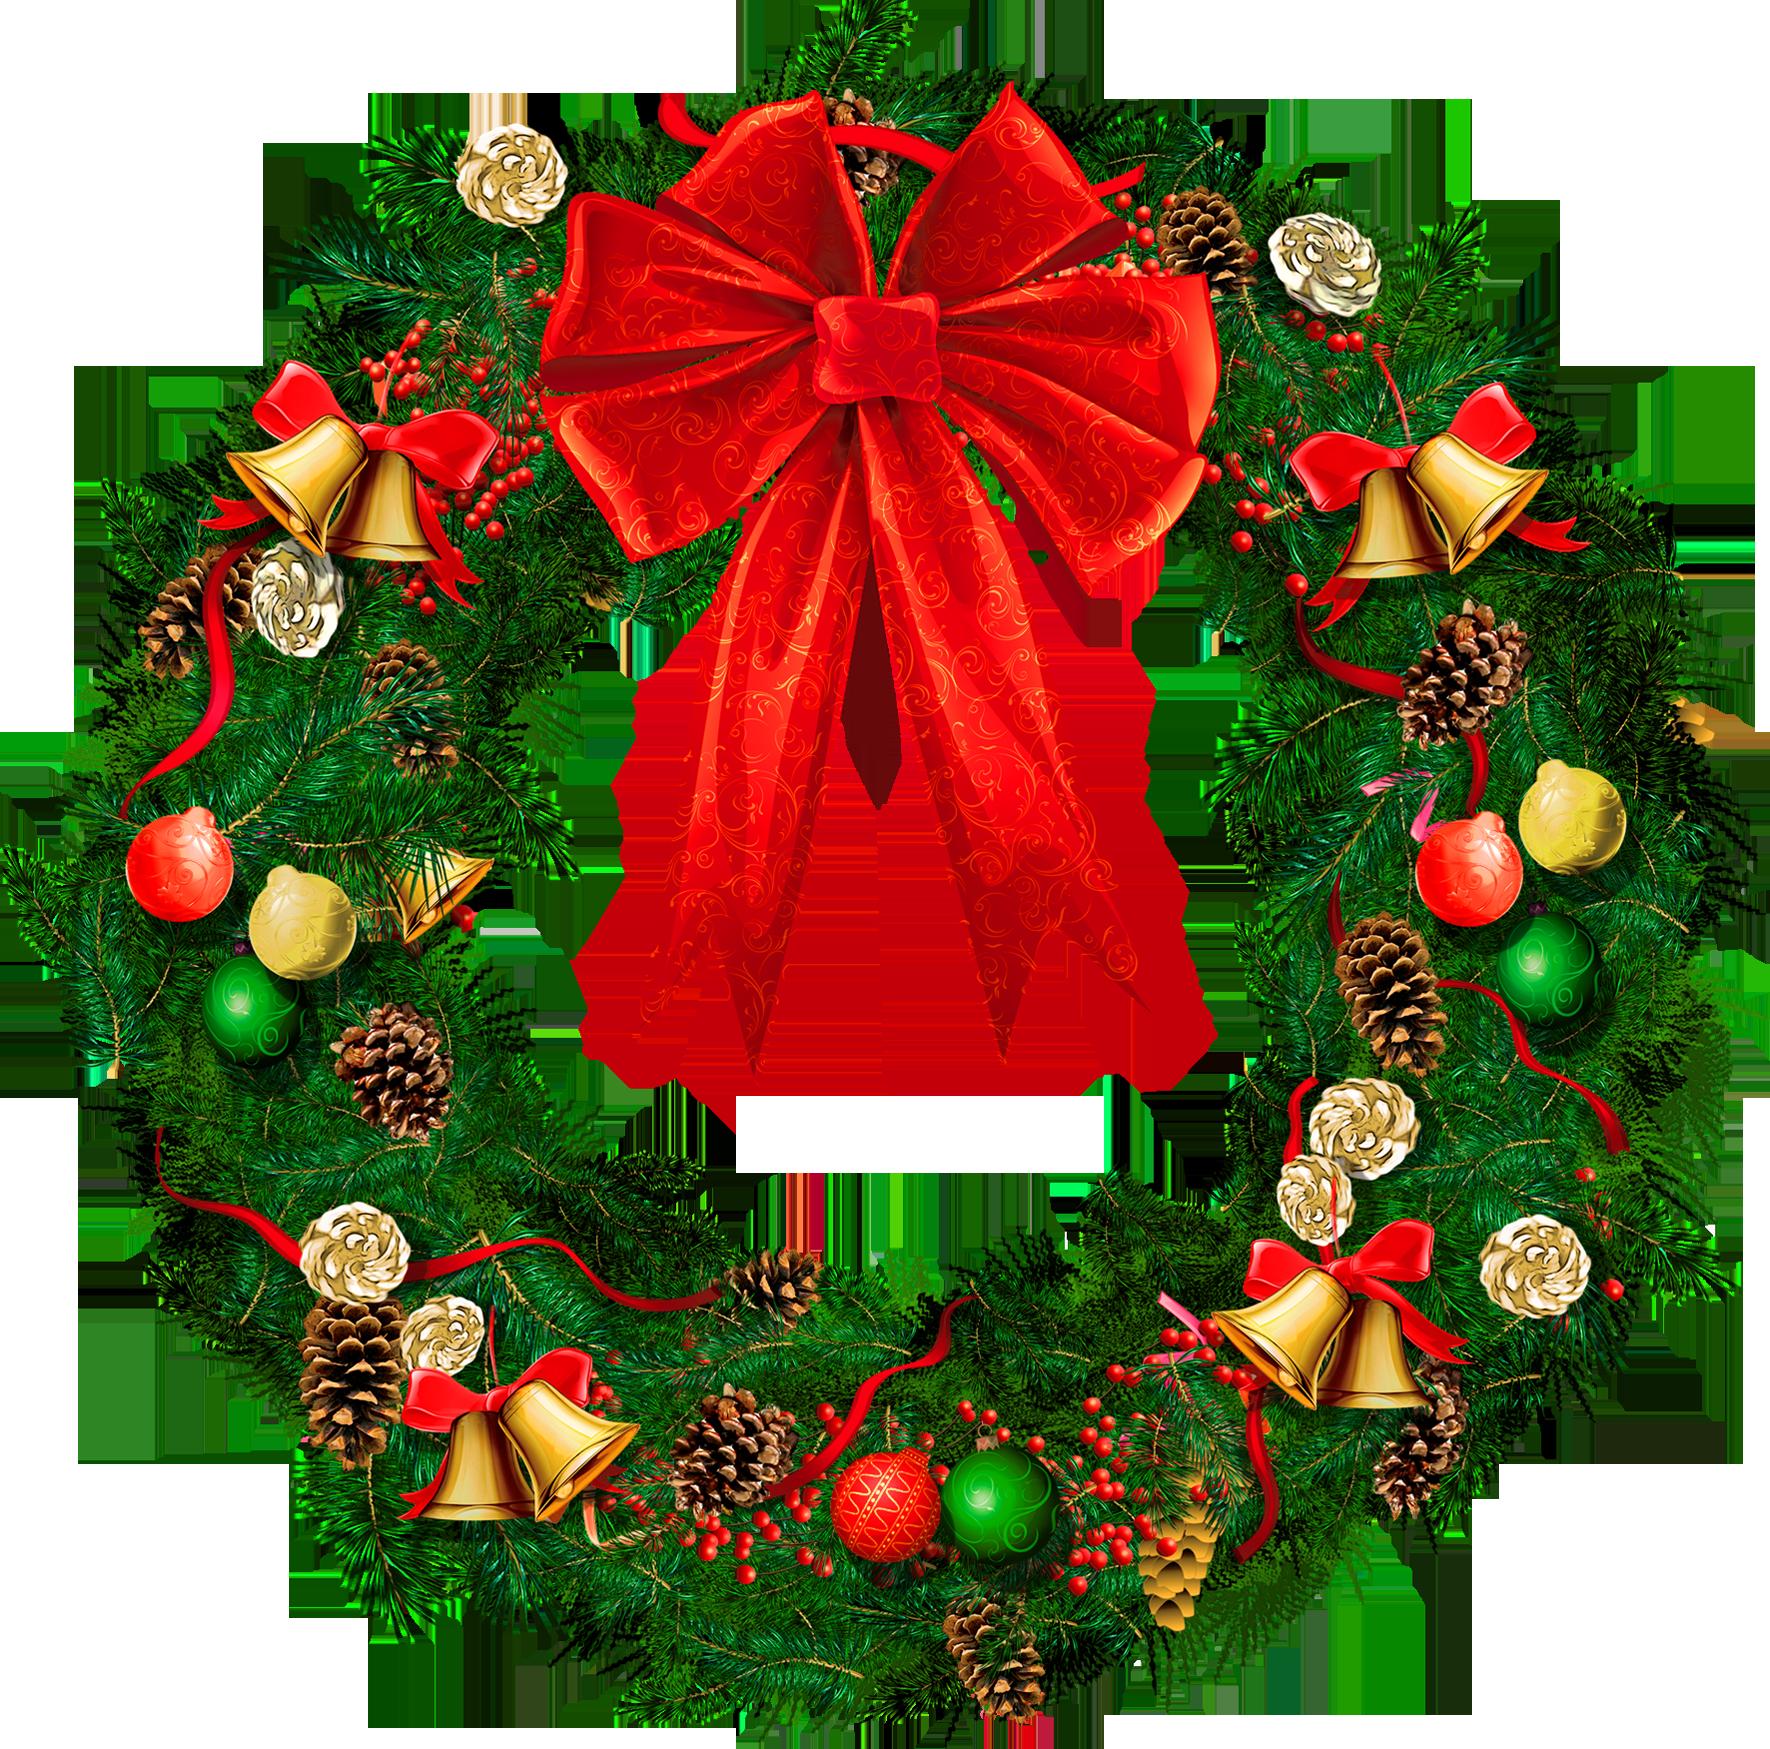 Free PNG HD Christmas Wreath - 126830